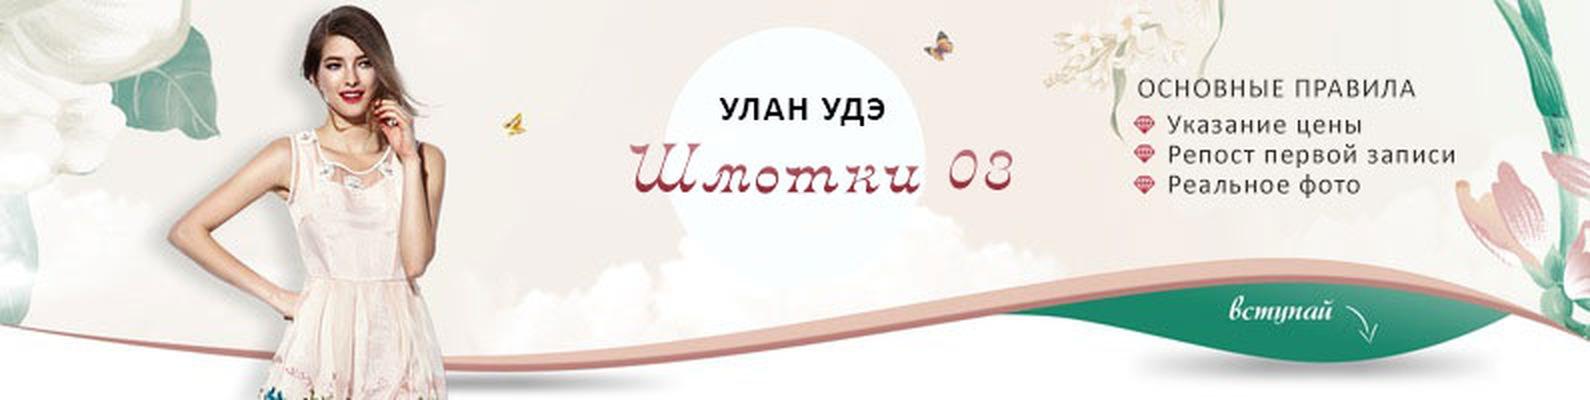 Шмотки 03   Улан Удэ   ВКонтакте 2ed5d19c224